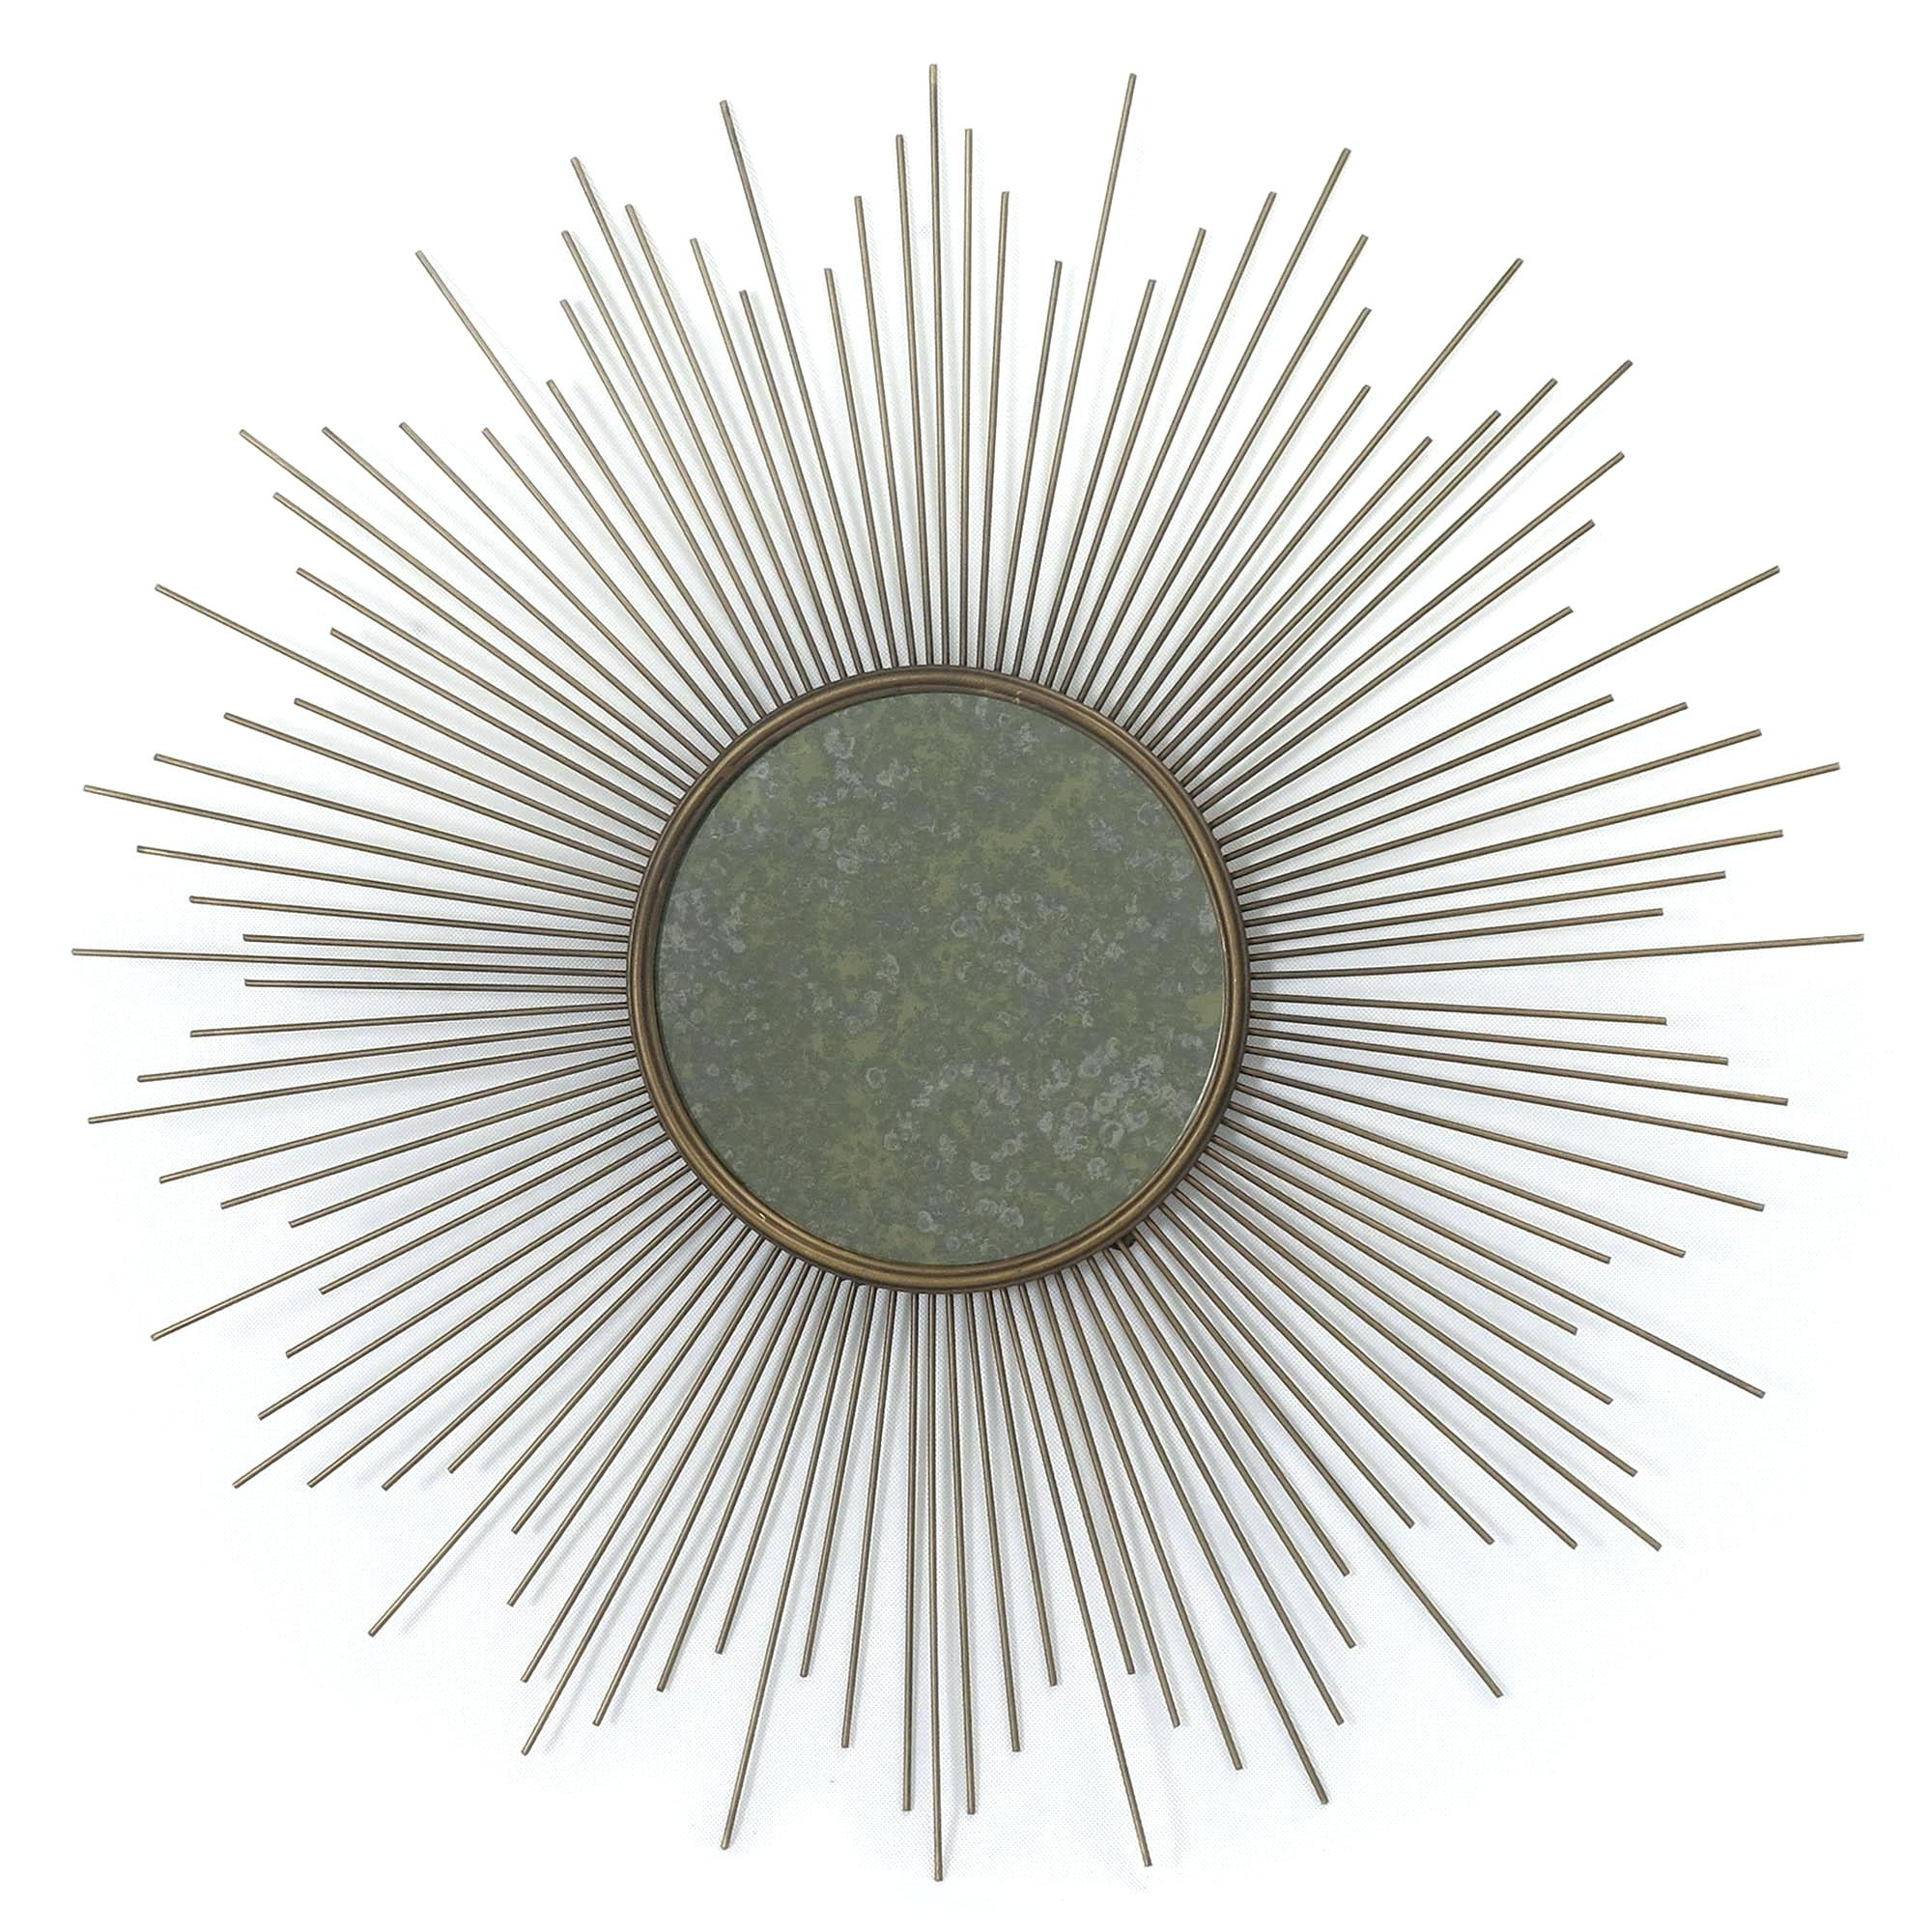 Popular Starburst Mirror Charm Starburst Mirrored Wall Art Vue Starburst Regarding Starburst Wall Art (View 14 of 15)